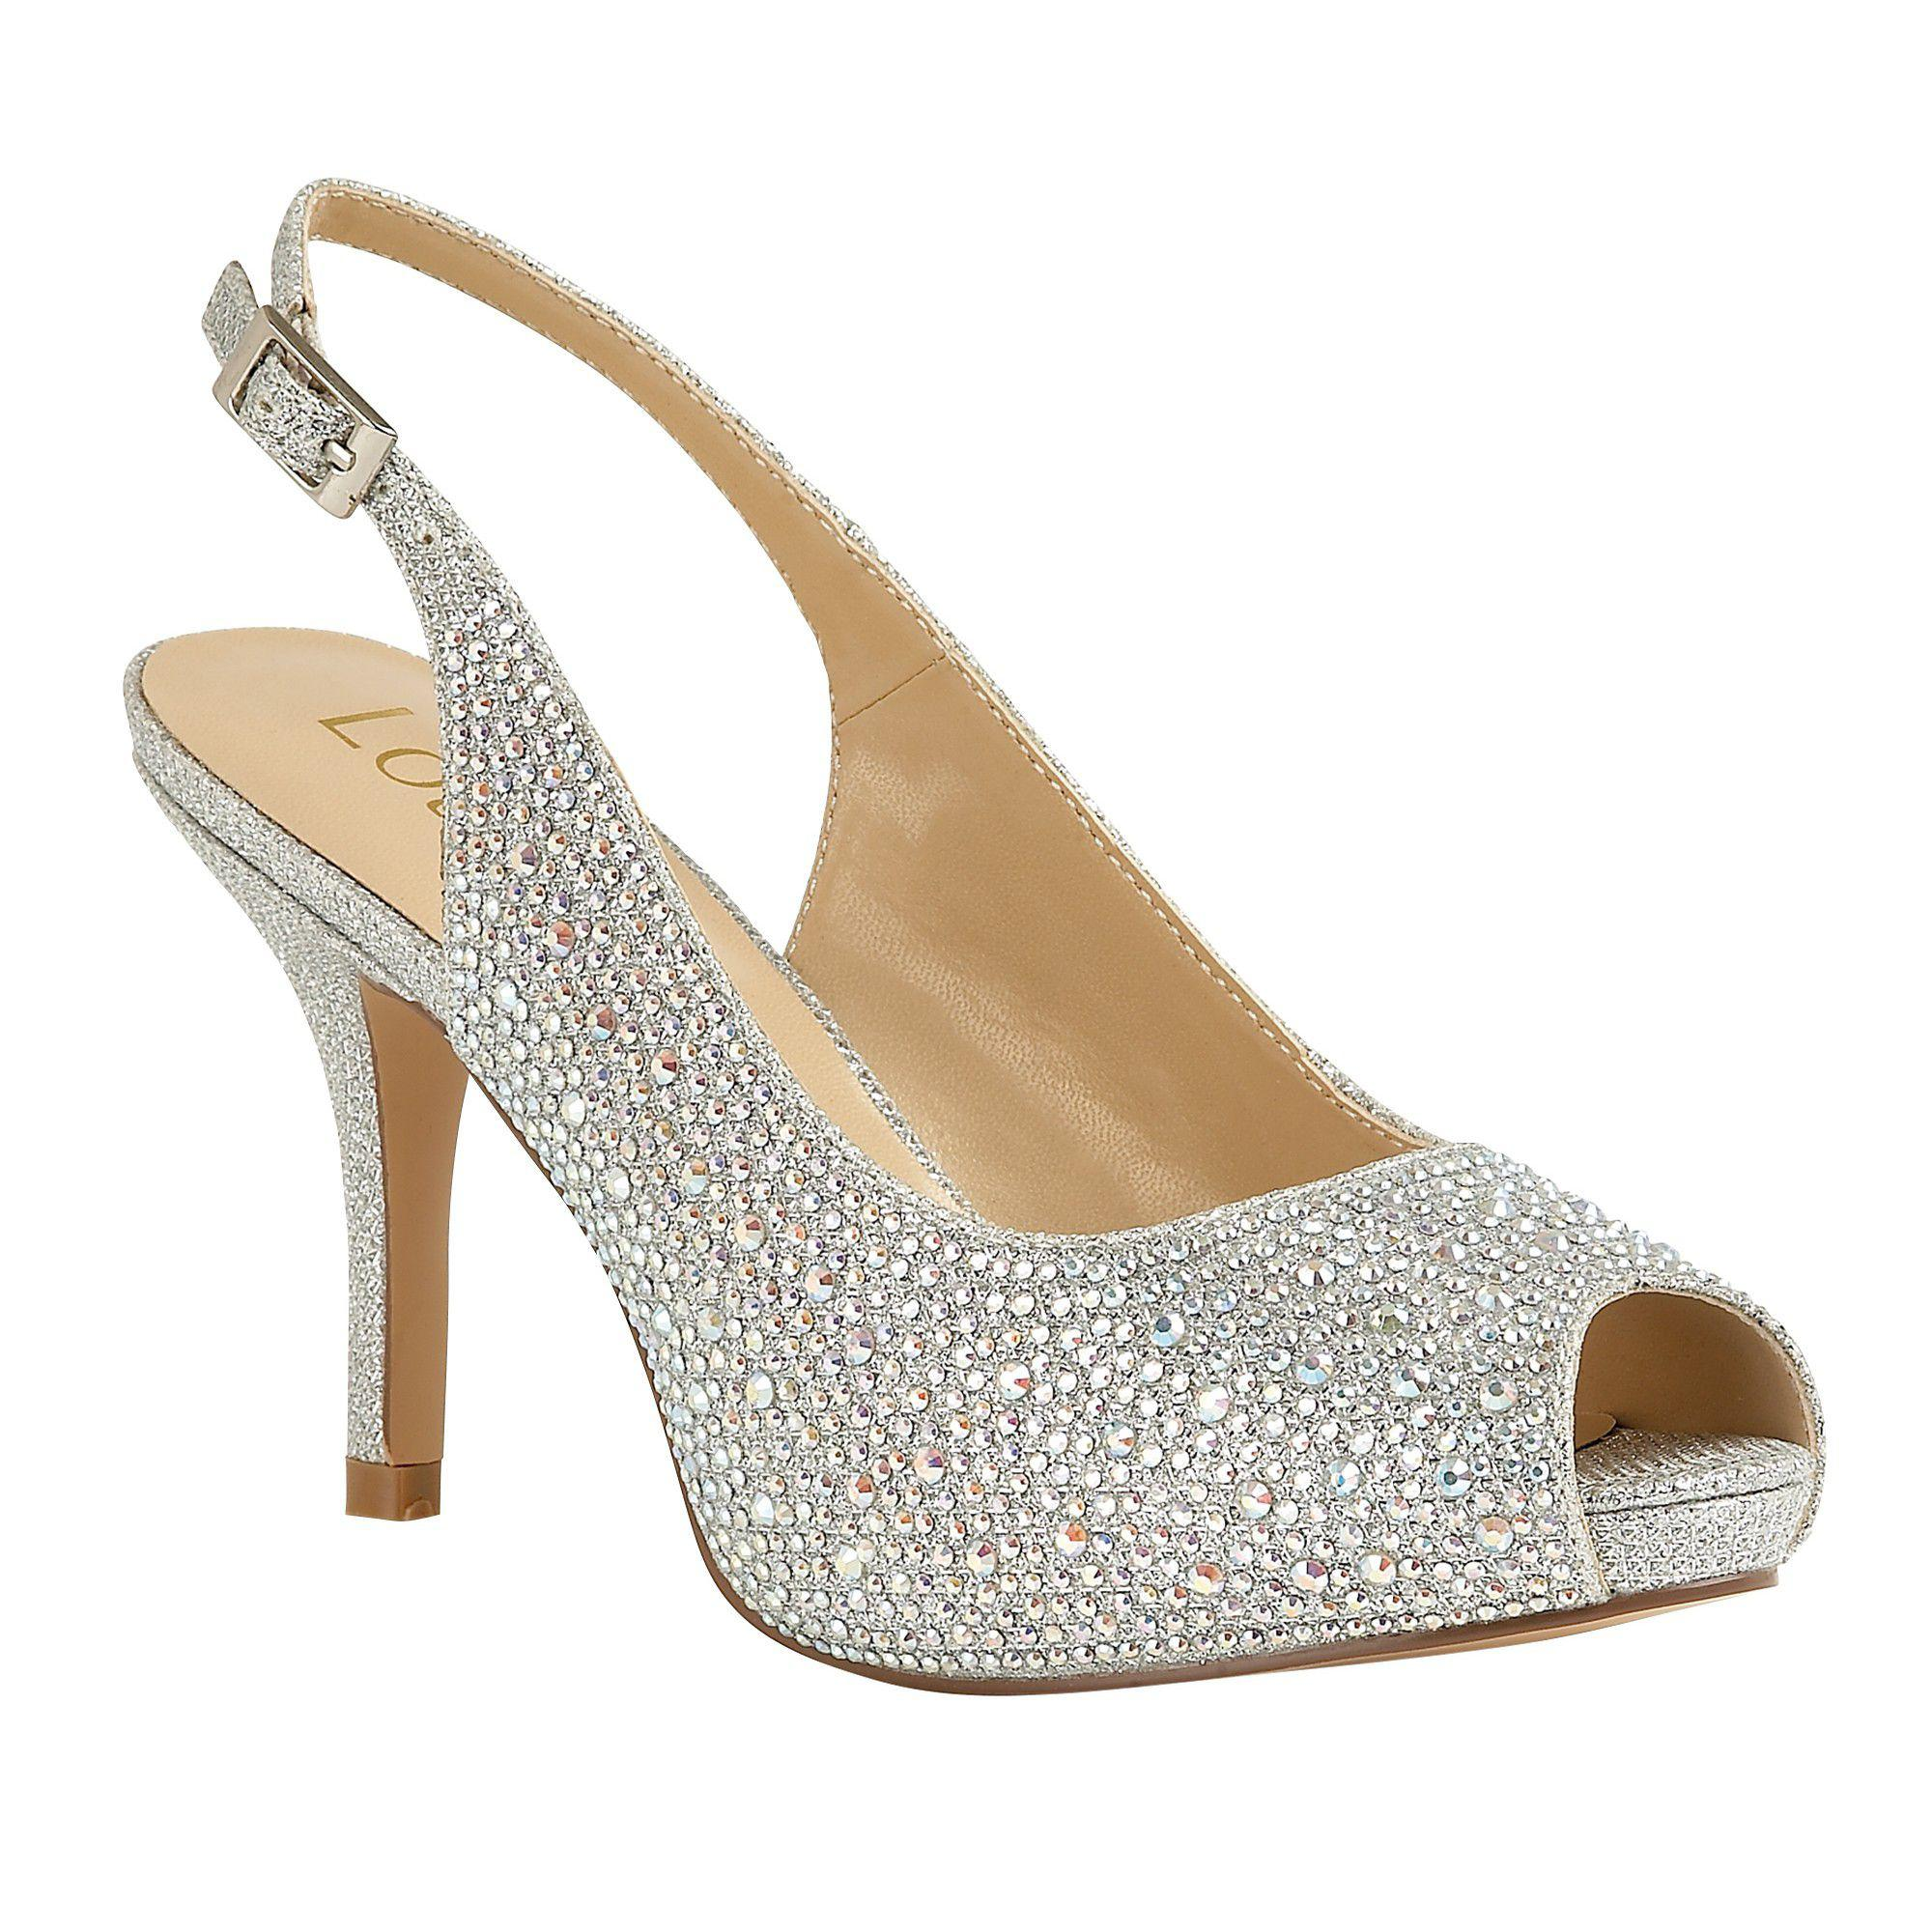 cd3ad60b2911 Lotus Silver Diamante  astro  High Stiletto Heel Slingbacks in ...